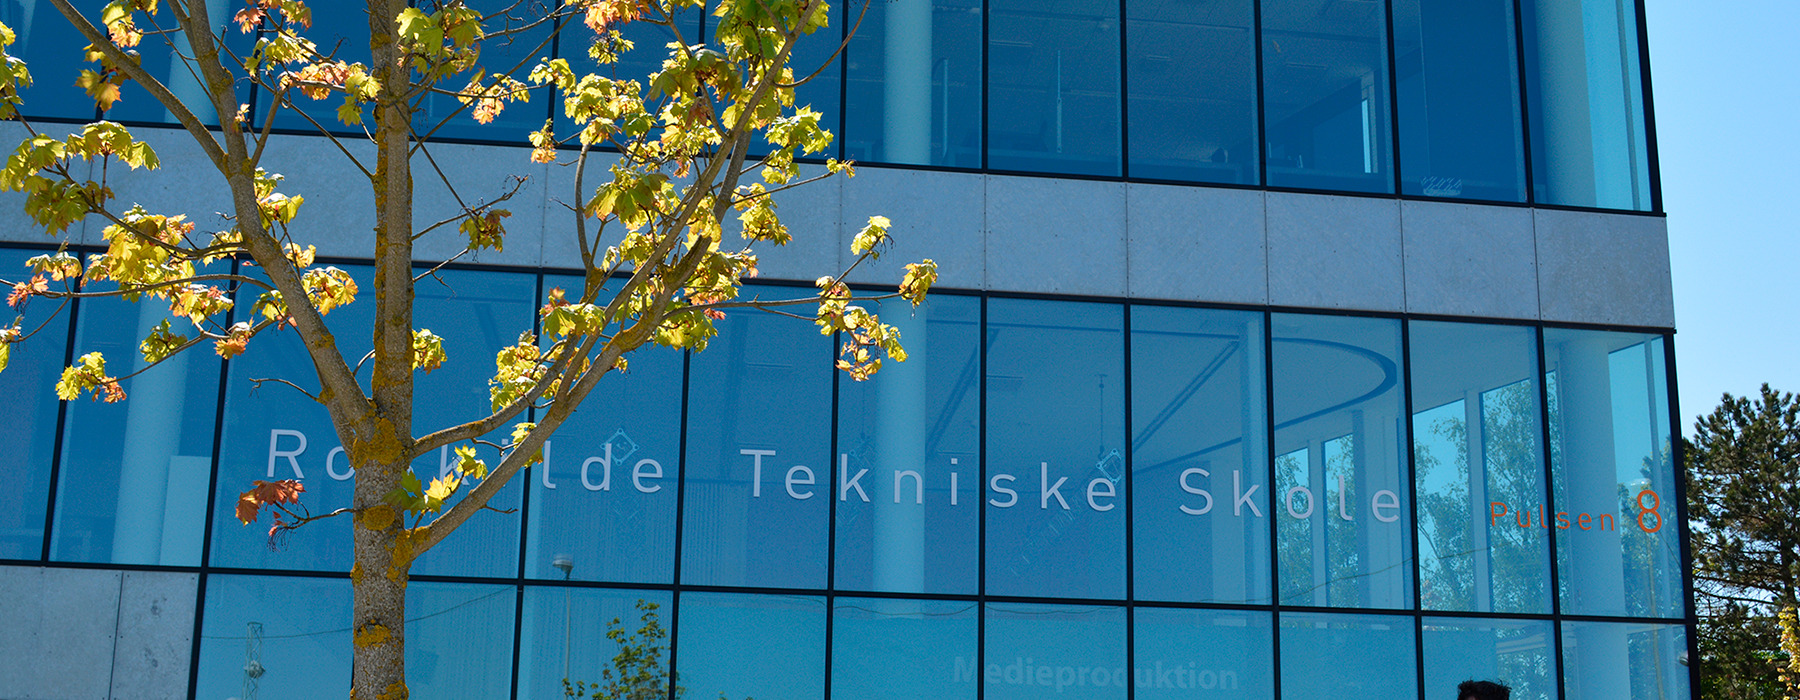 Roskilde Tekniske Skole - Pulsen 8